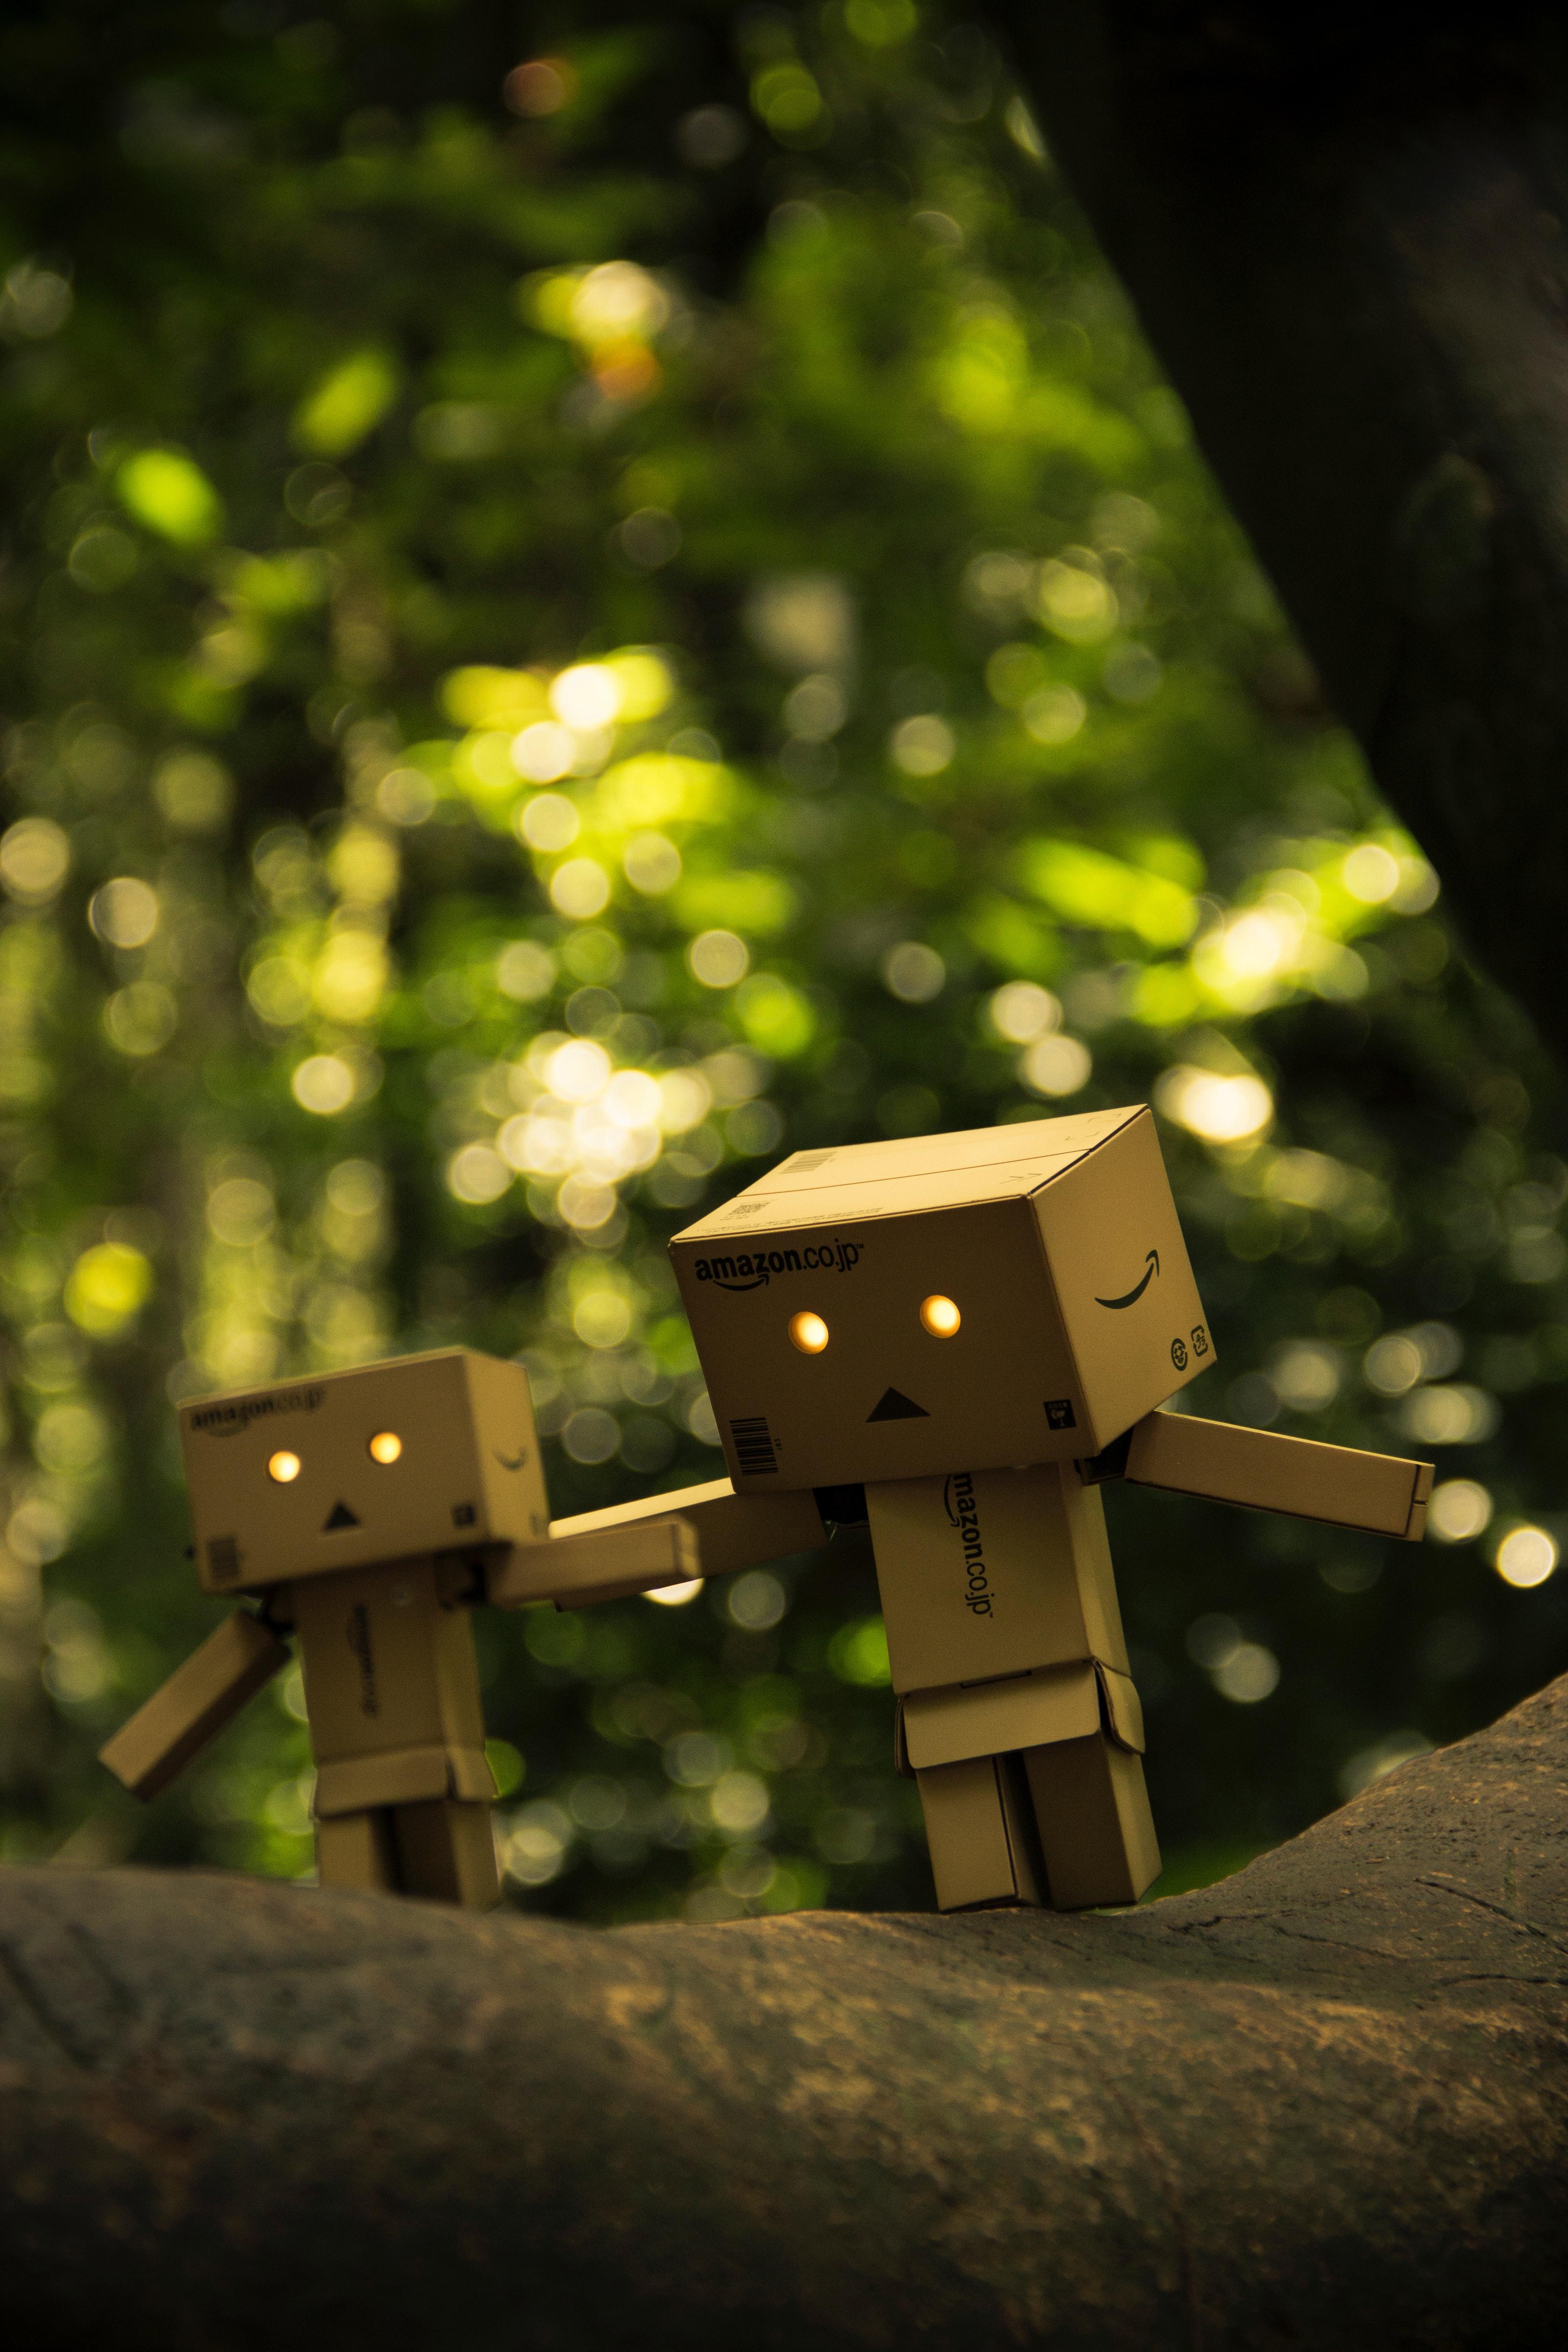 Three brown cardboard box figures on brown surface photo